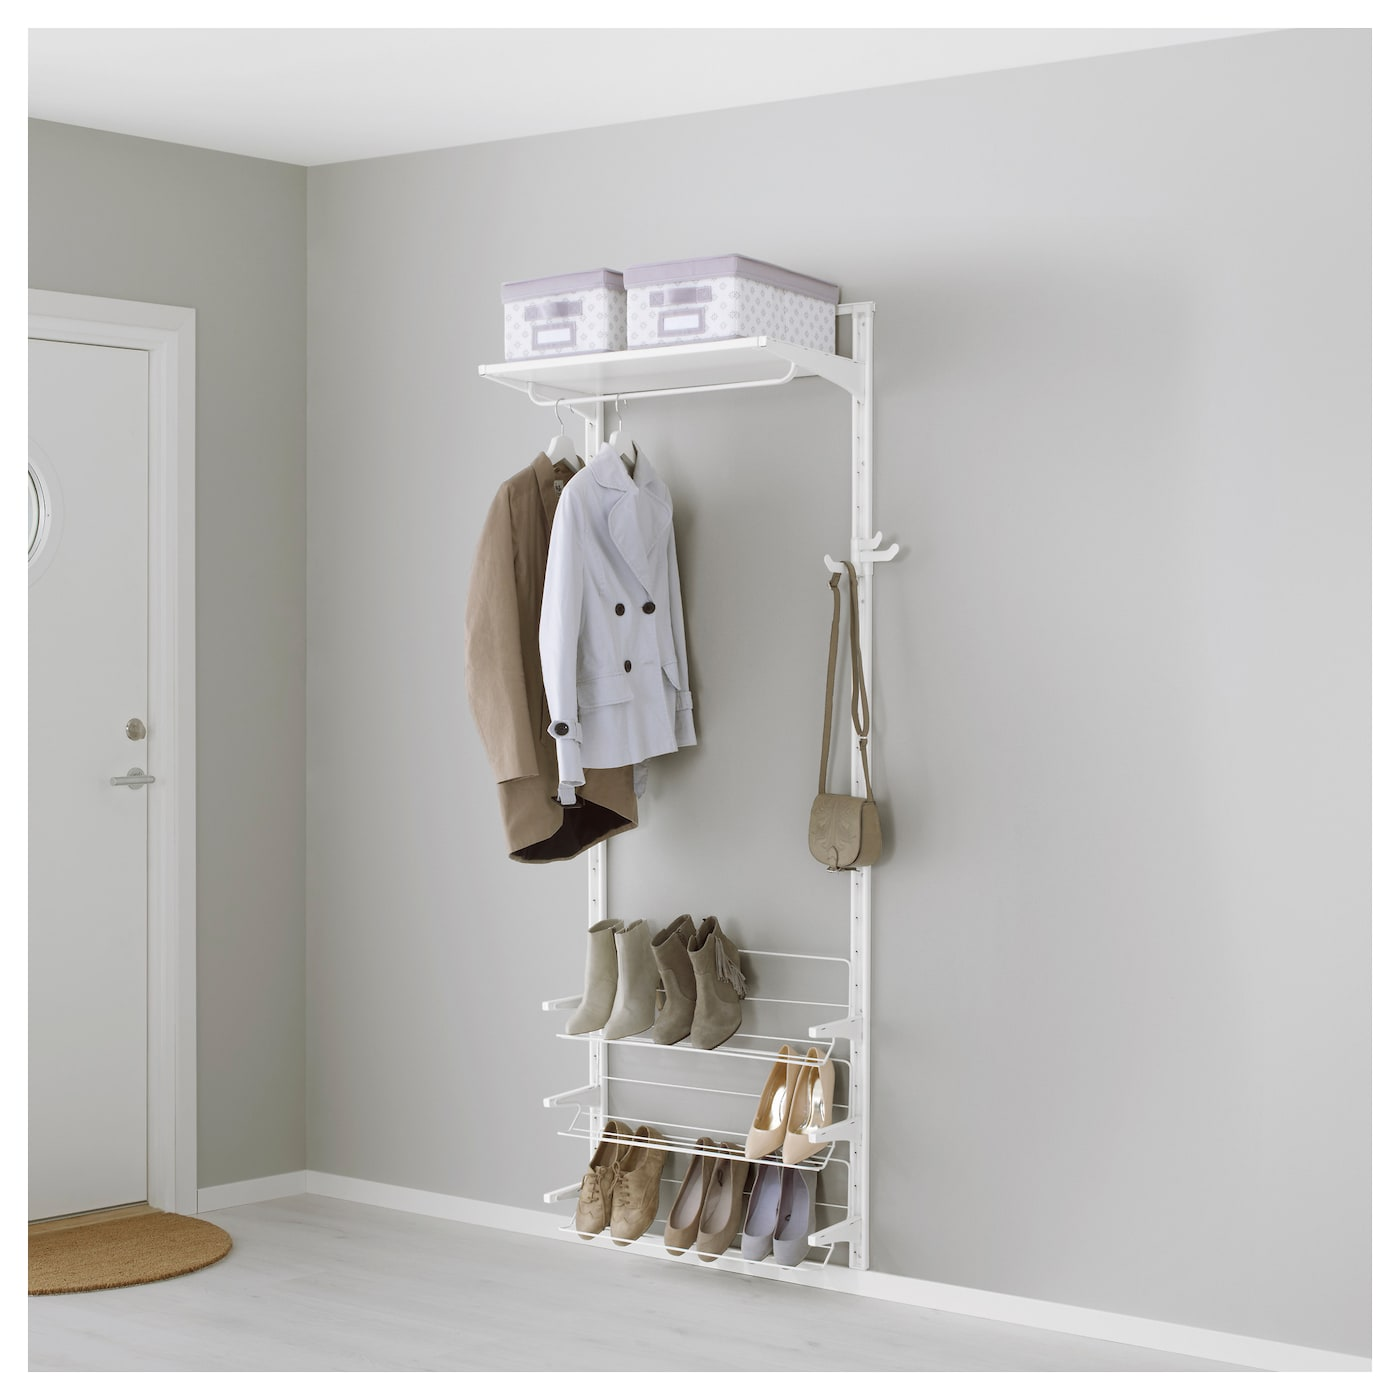 Algot Wall Upright Shelves Shoe Organiser